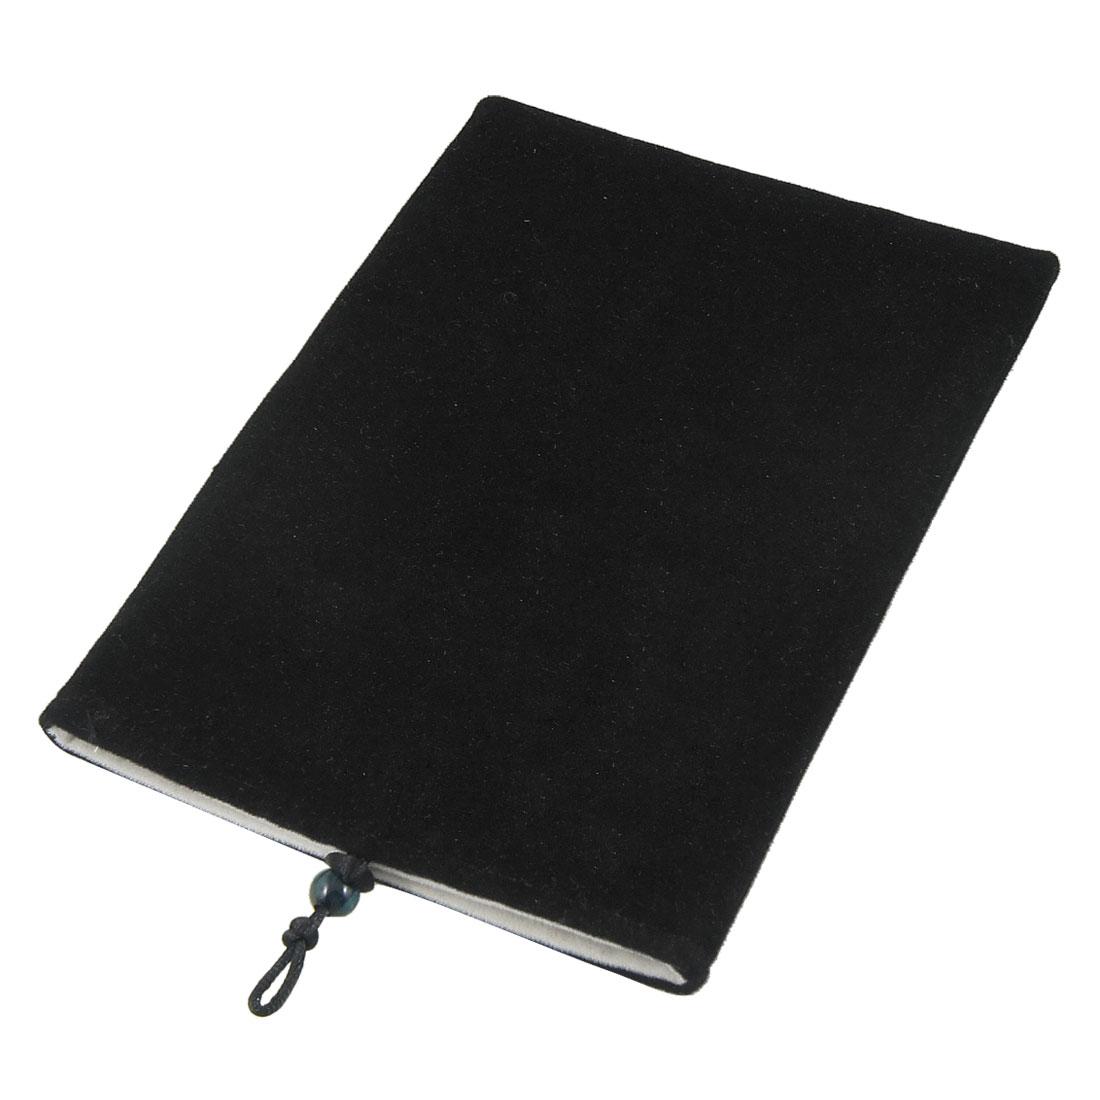 "Black Velvet Protect Pouch Bag Cover Sleeve Case for 8"" Ebook Reader Tablet"